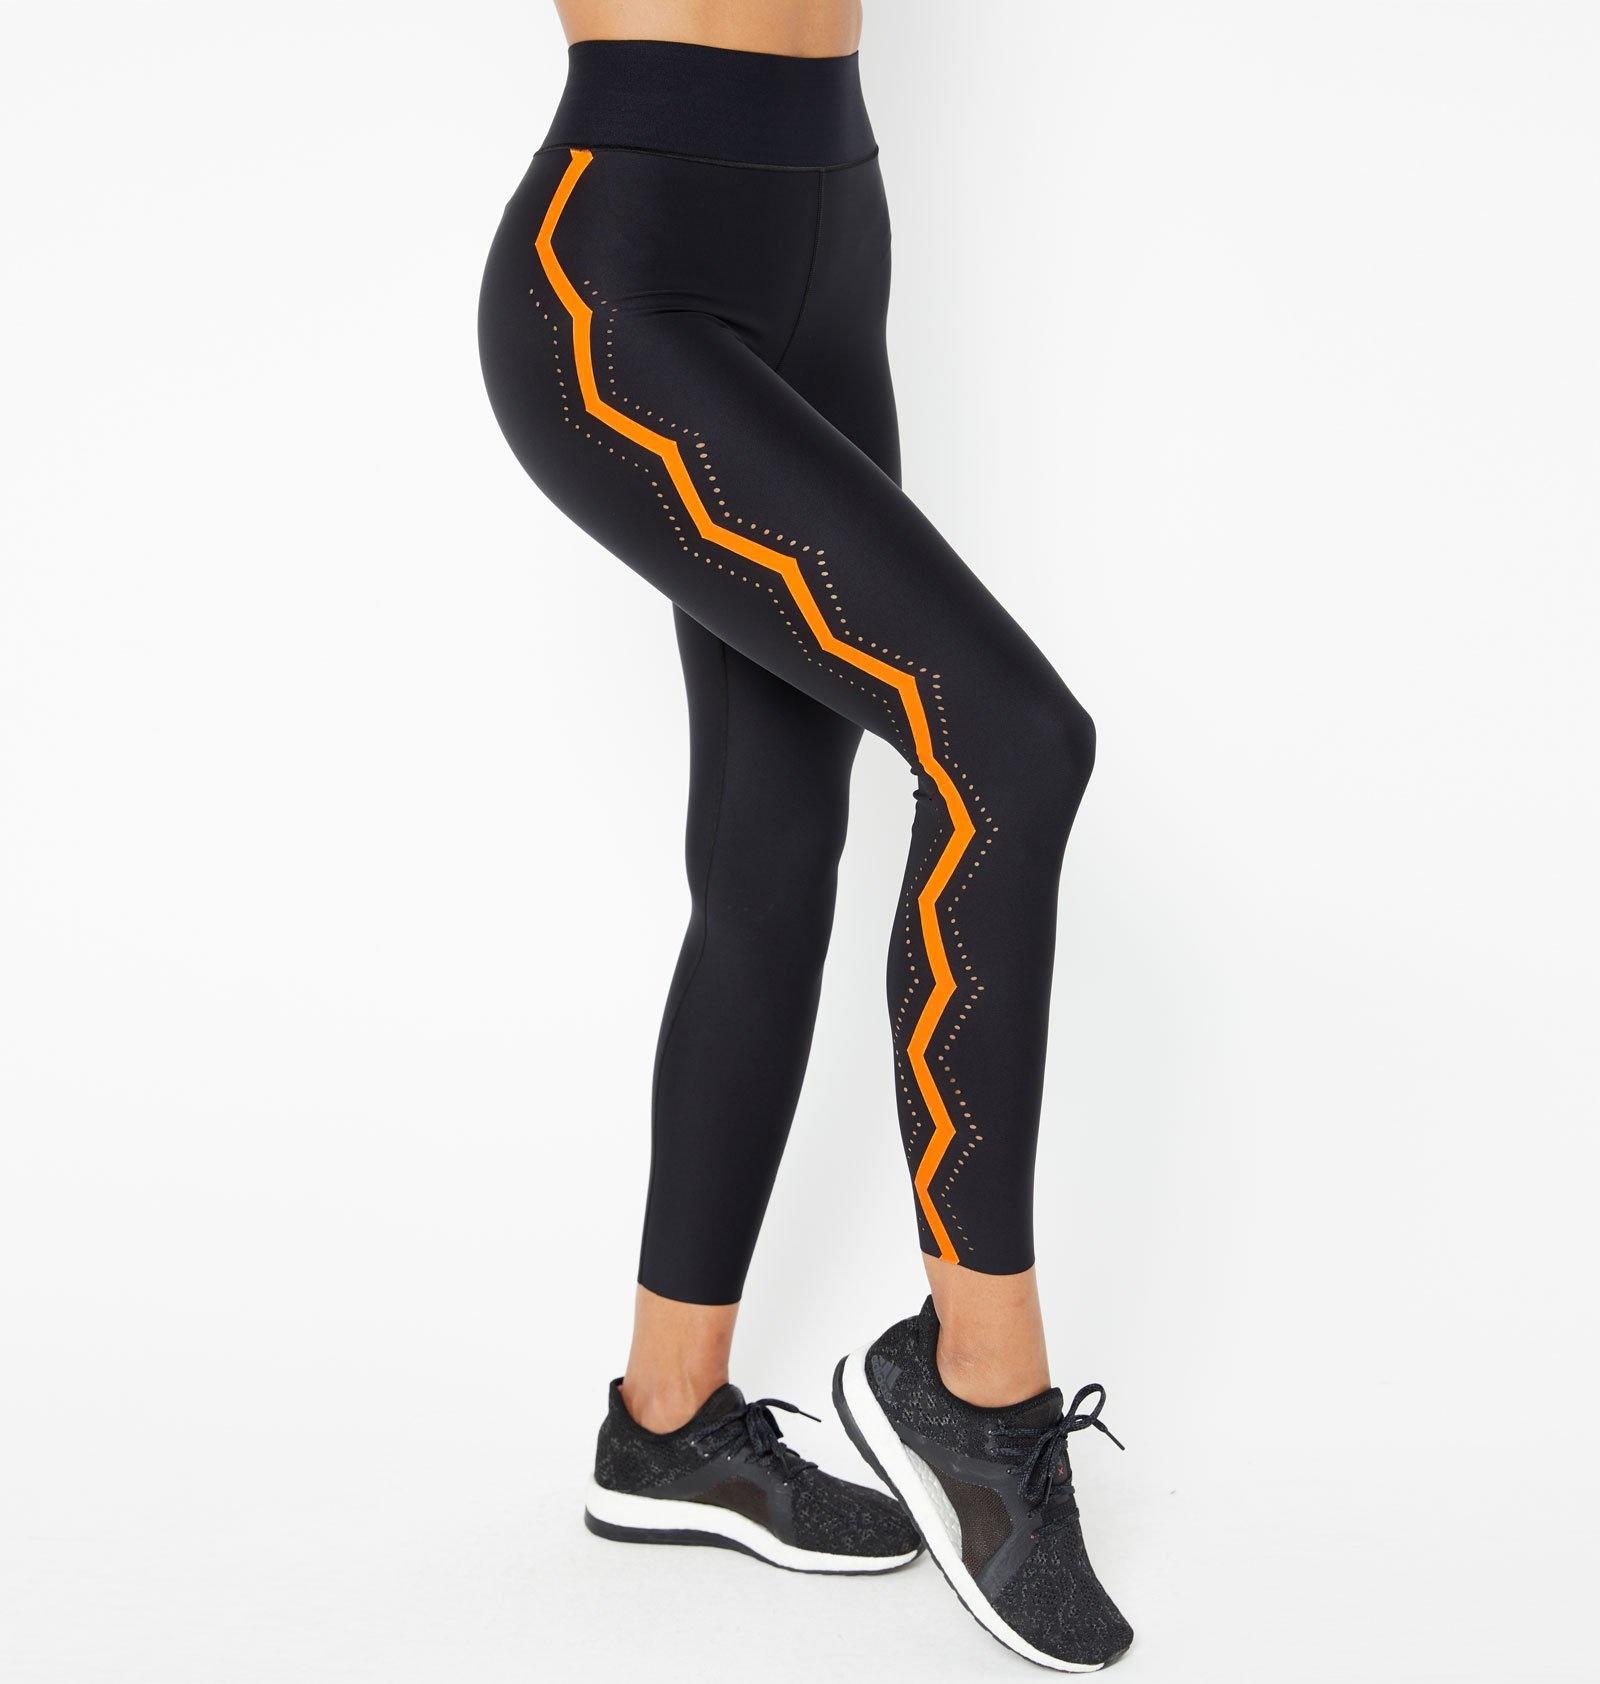 Ultracor Ultra High Serrated Legging Neon Orange